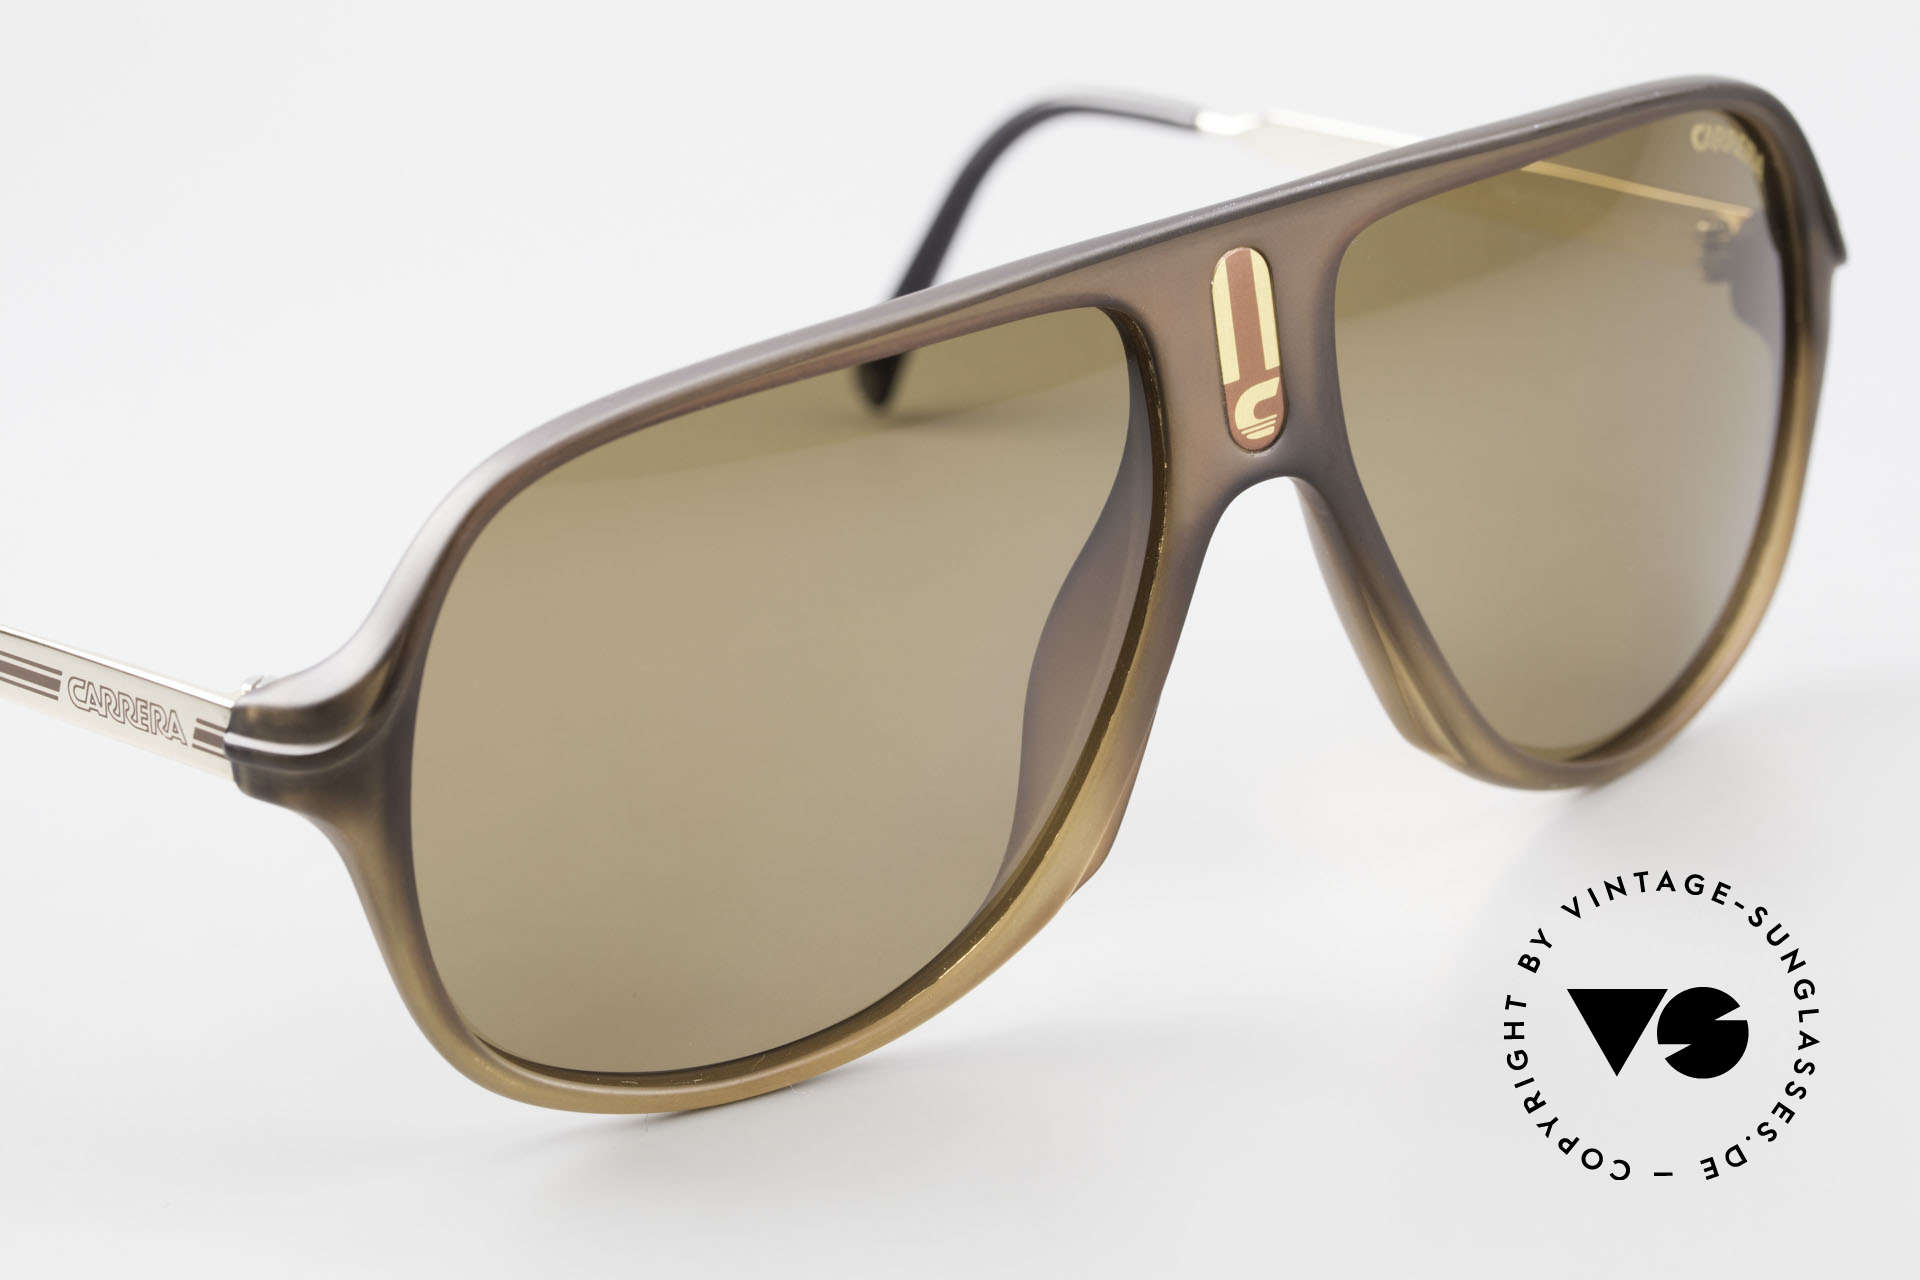 Carrera 5547 Polarized 80's Sunglasses, NO RETRO sunglasses, but a rare 35 years old Original, Made for Men